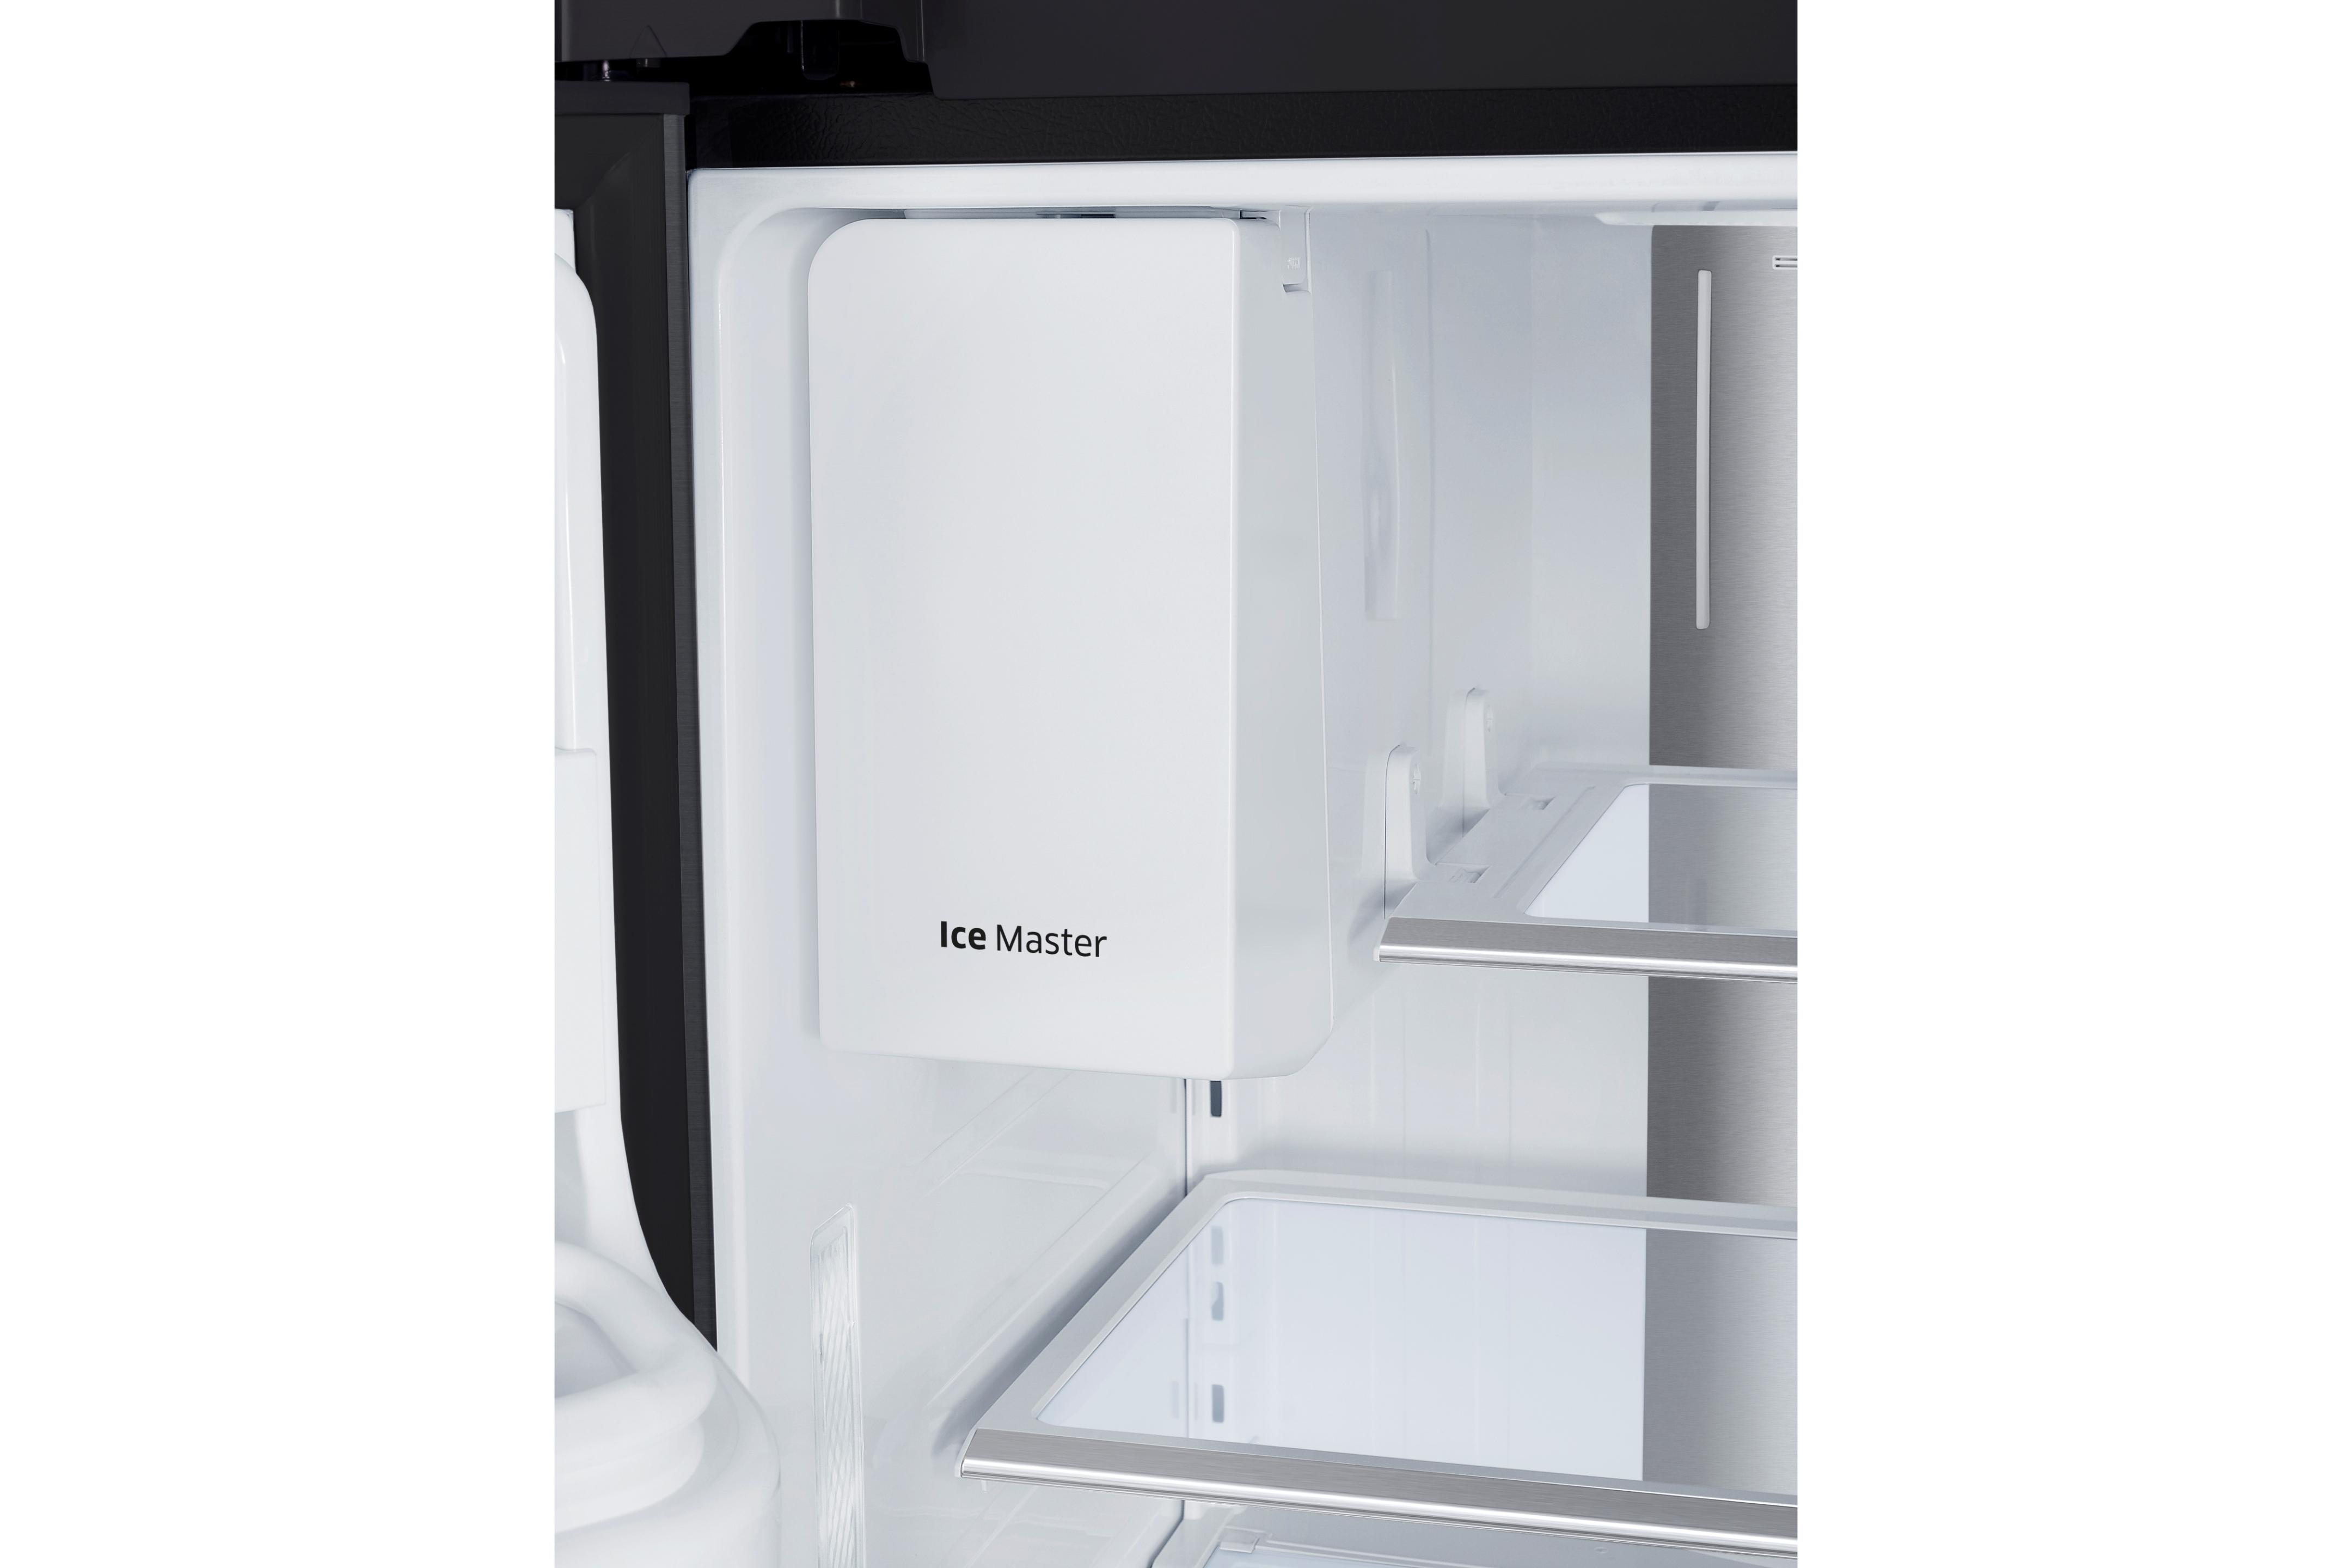 Samsung RF22KREDBSG/AA 22.4 cu. ft. Counter Depth 4-Door French Door Food Showcase Refrigerator - Black Stainless Steel